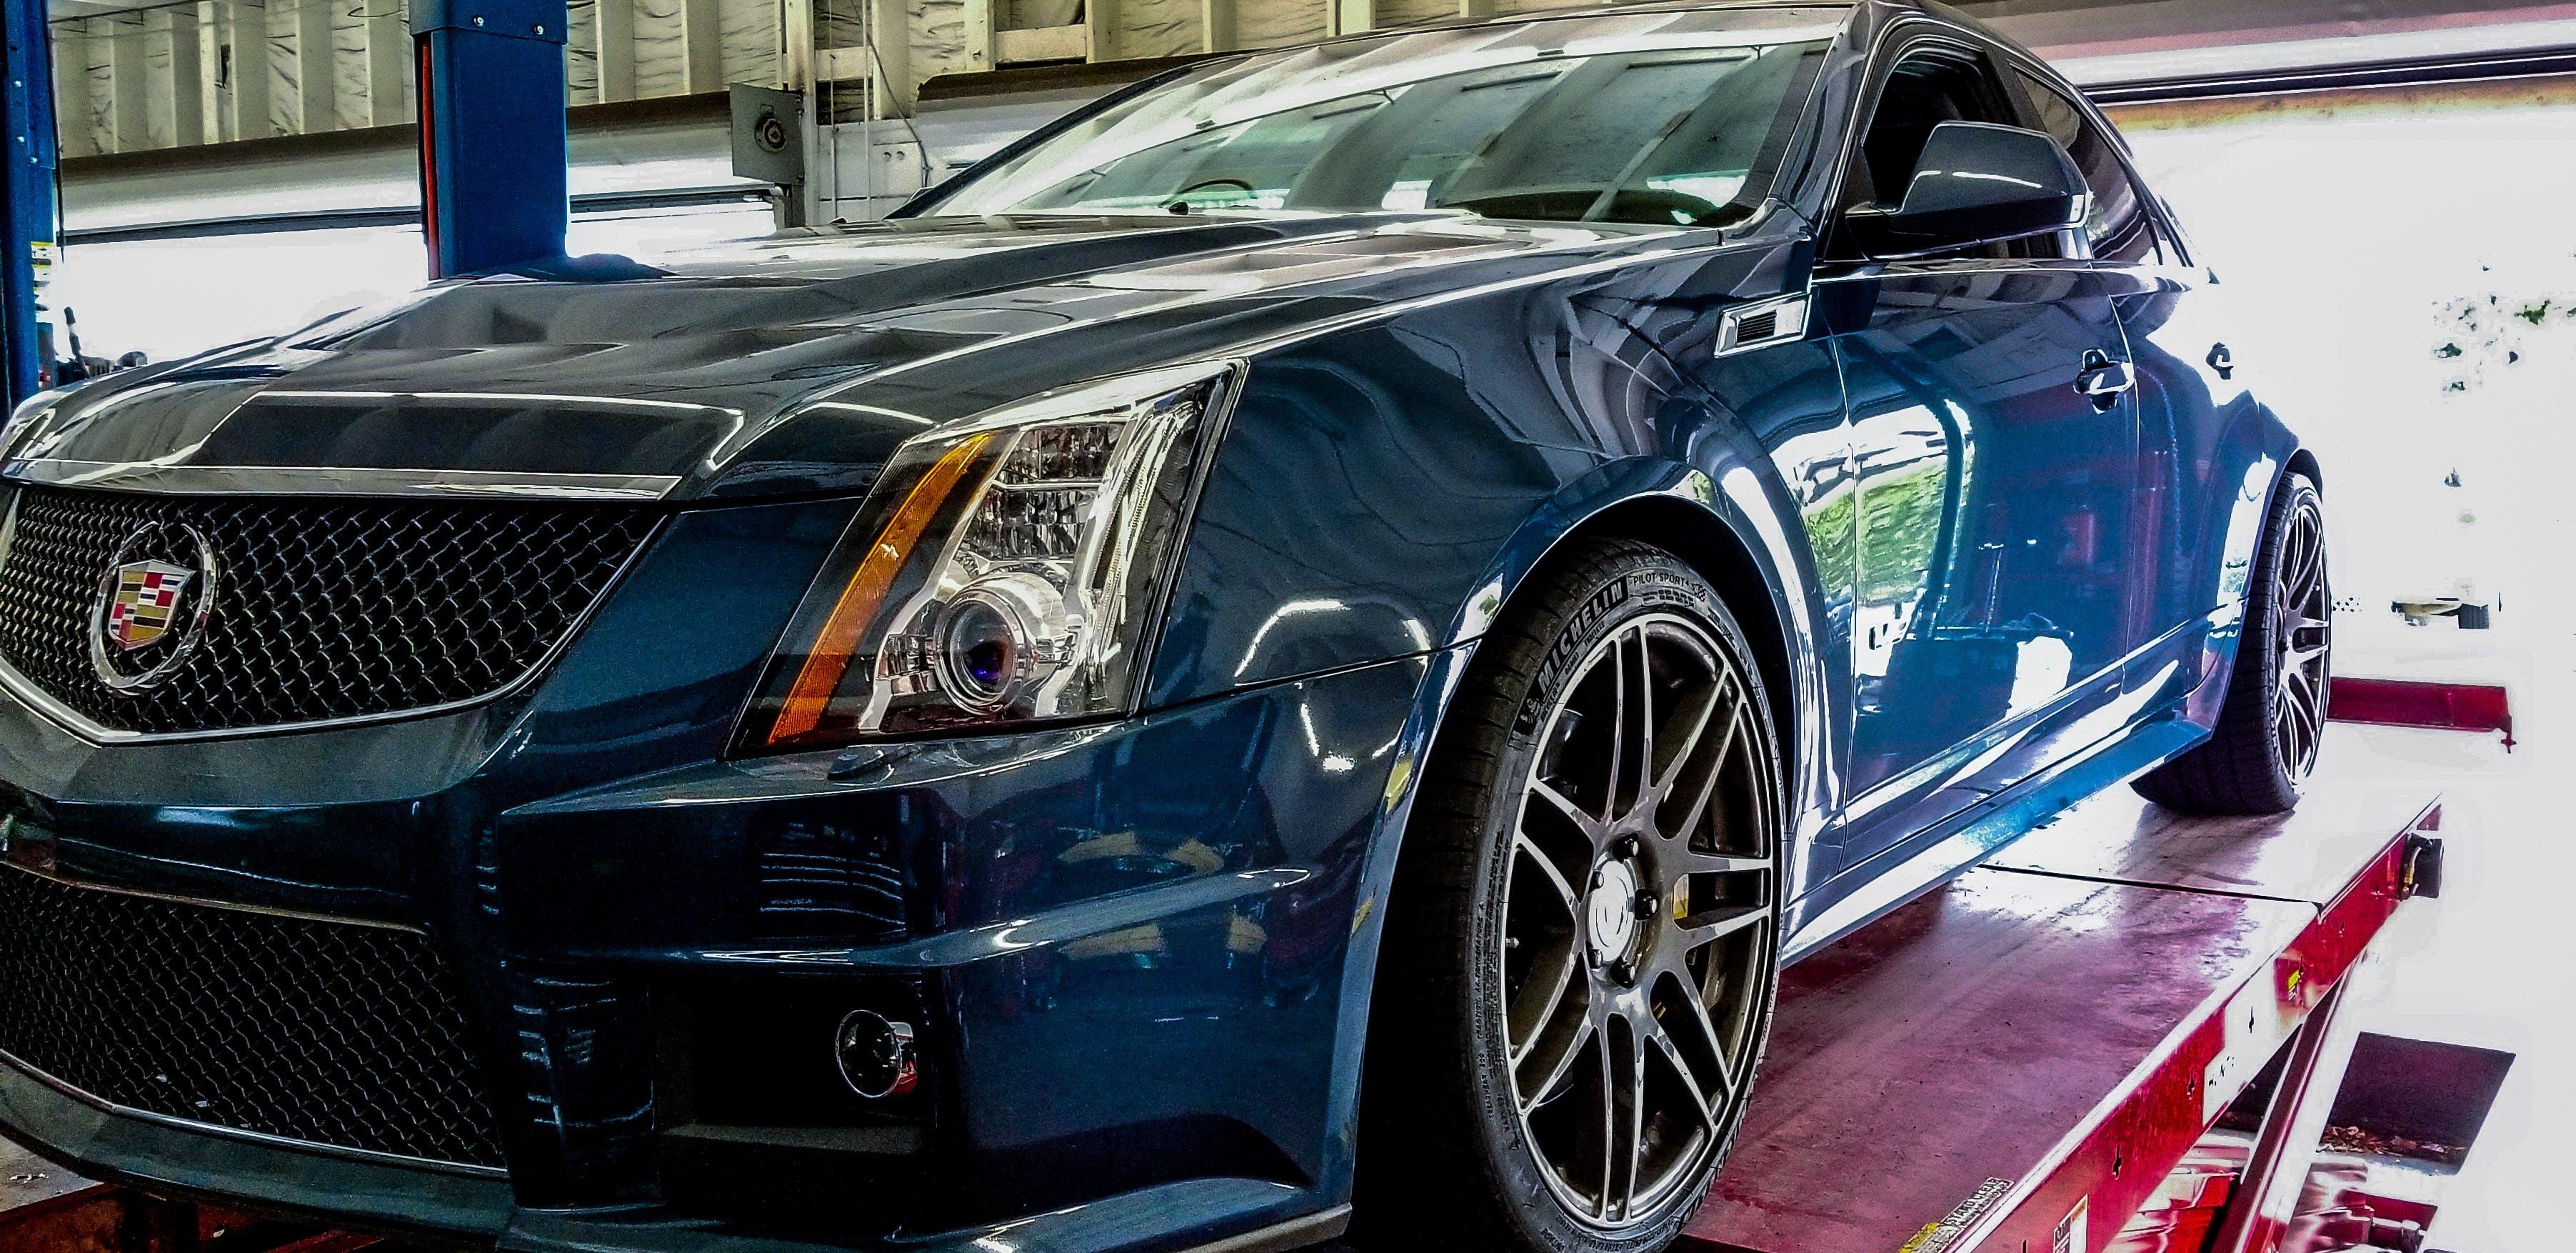 Free stock photo of american car, cadillac, cars, power